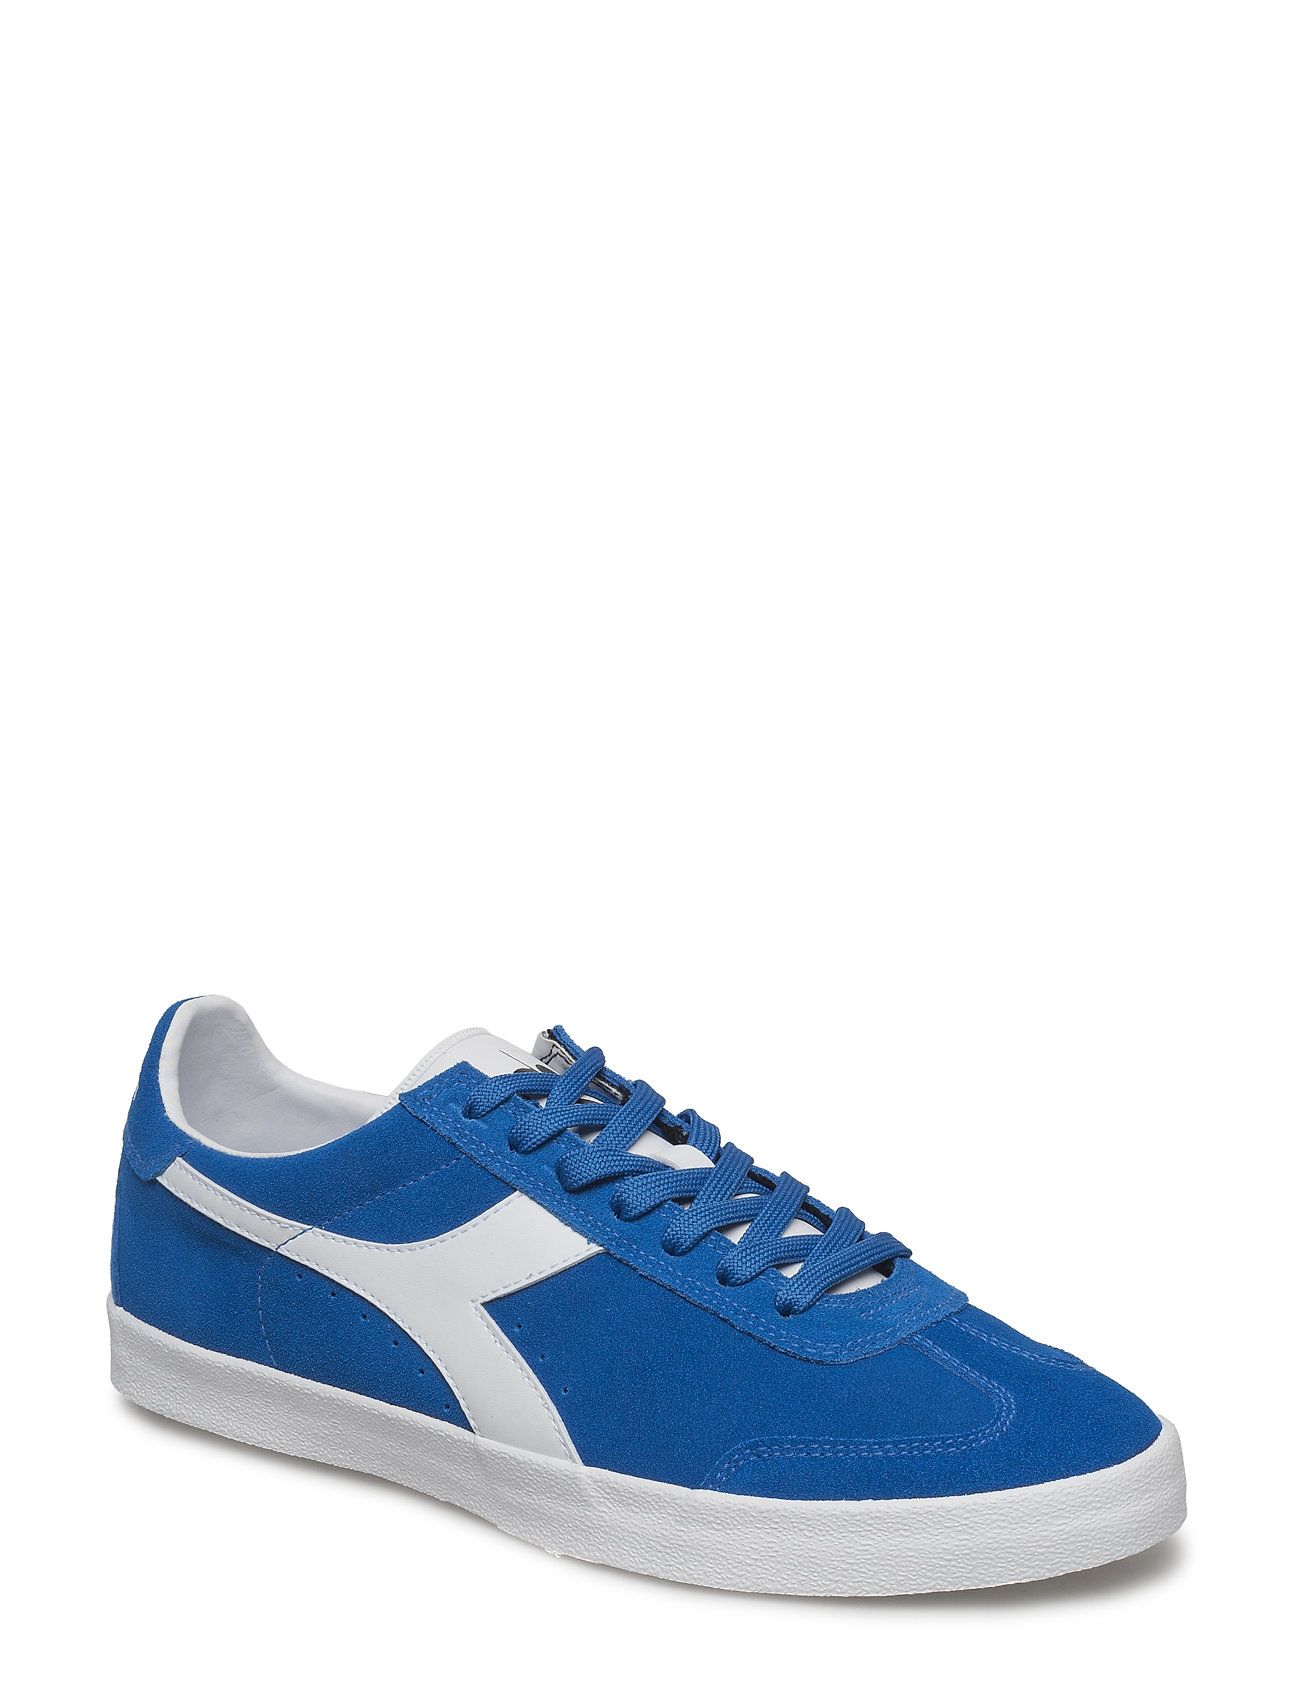 B.Original Vlz Diadora Sneakers til Herrer i